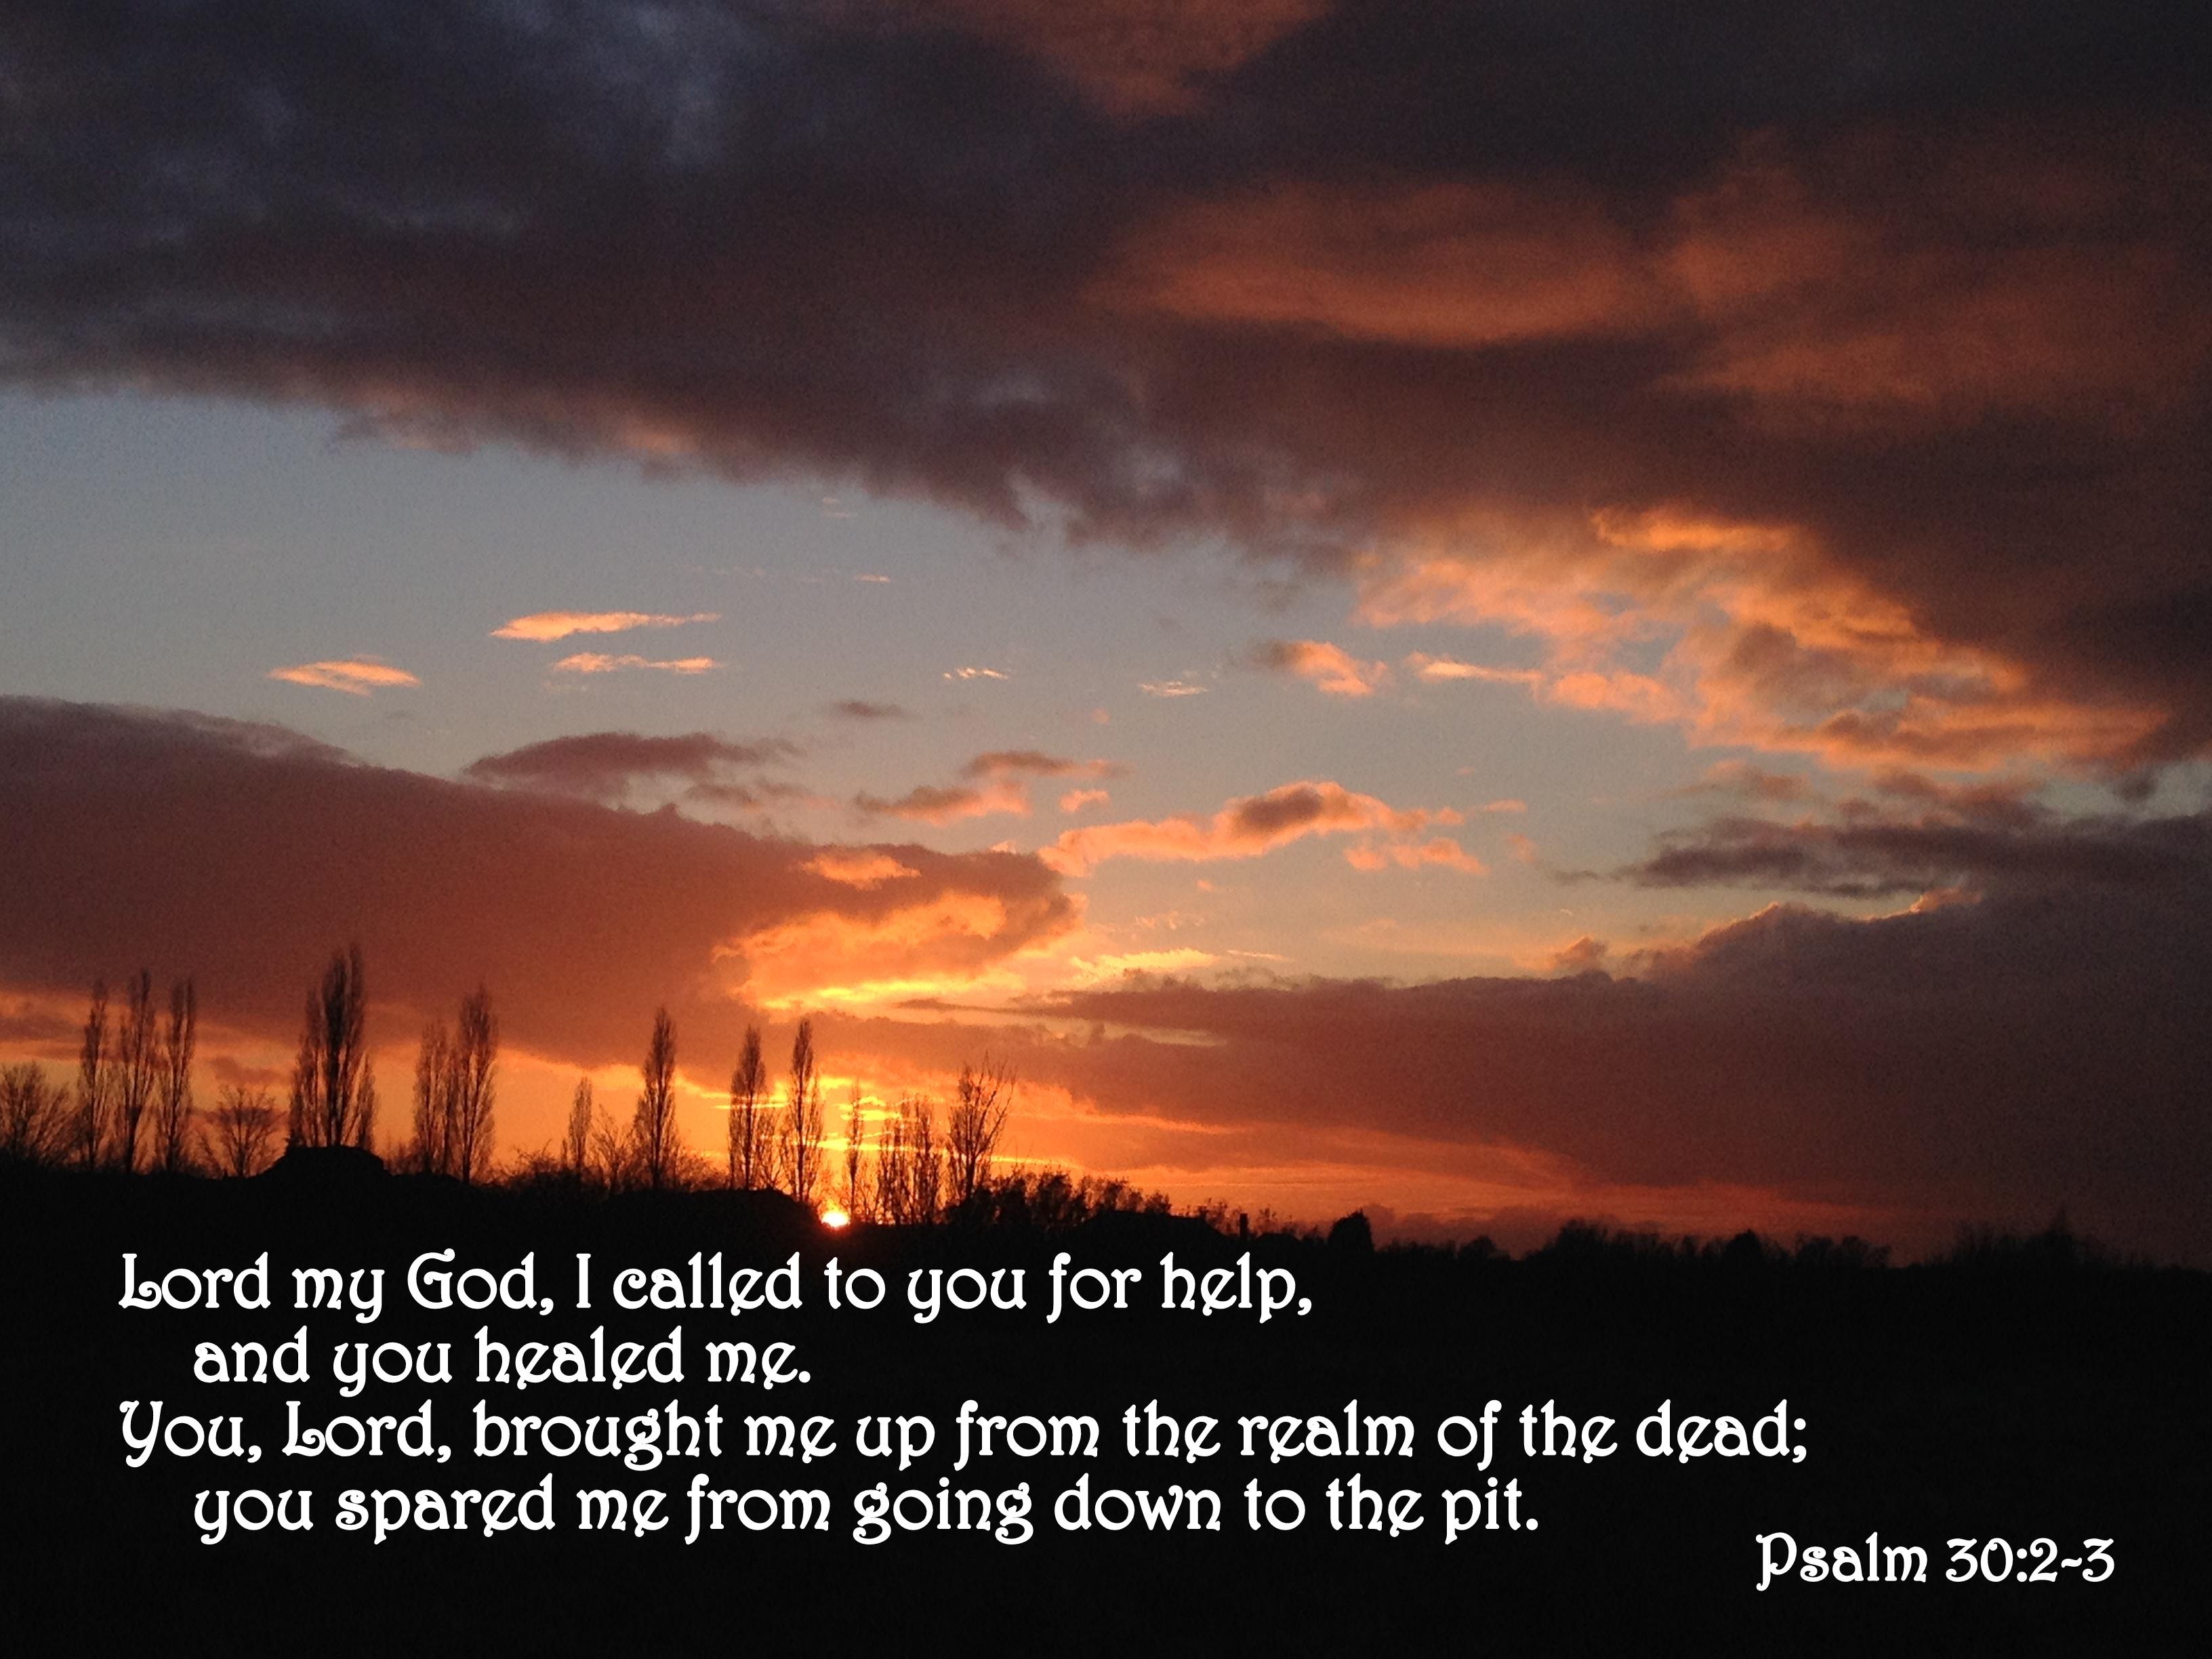 psalm-30-2-3